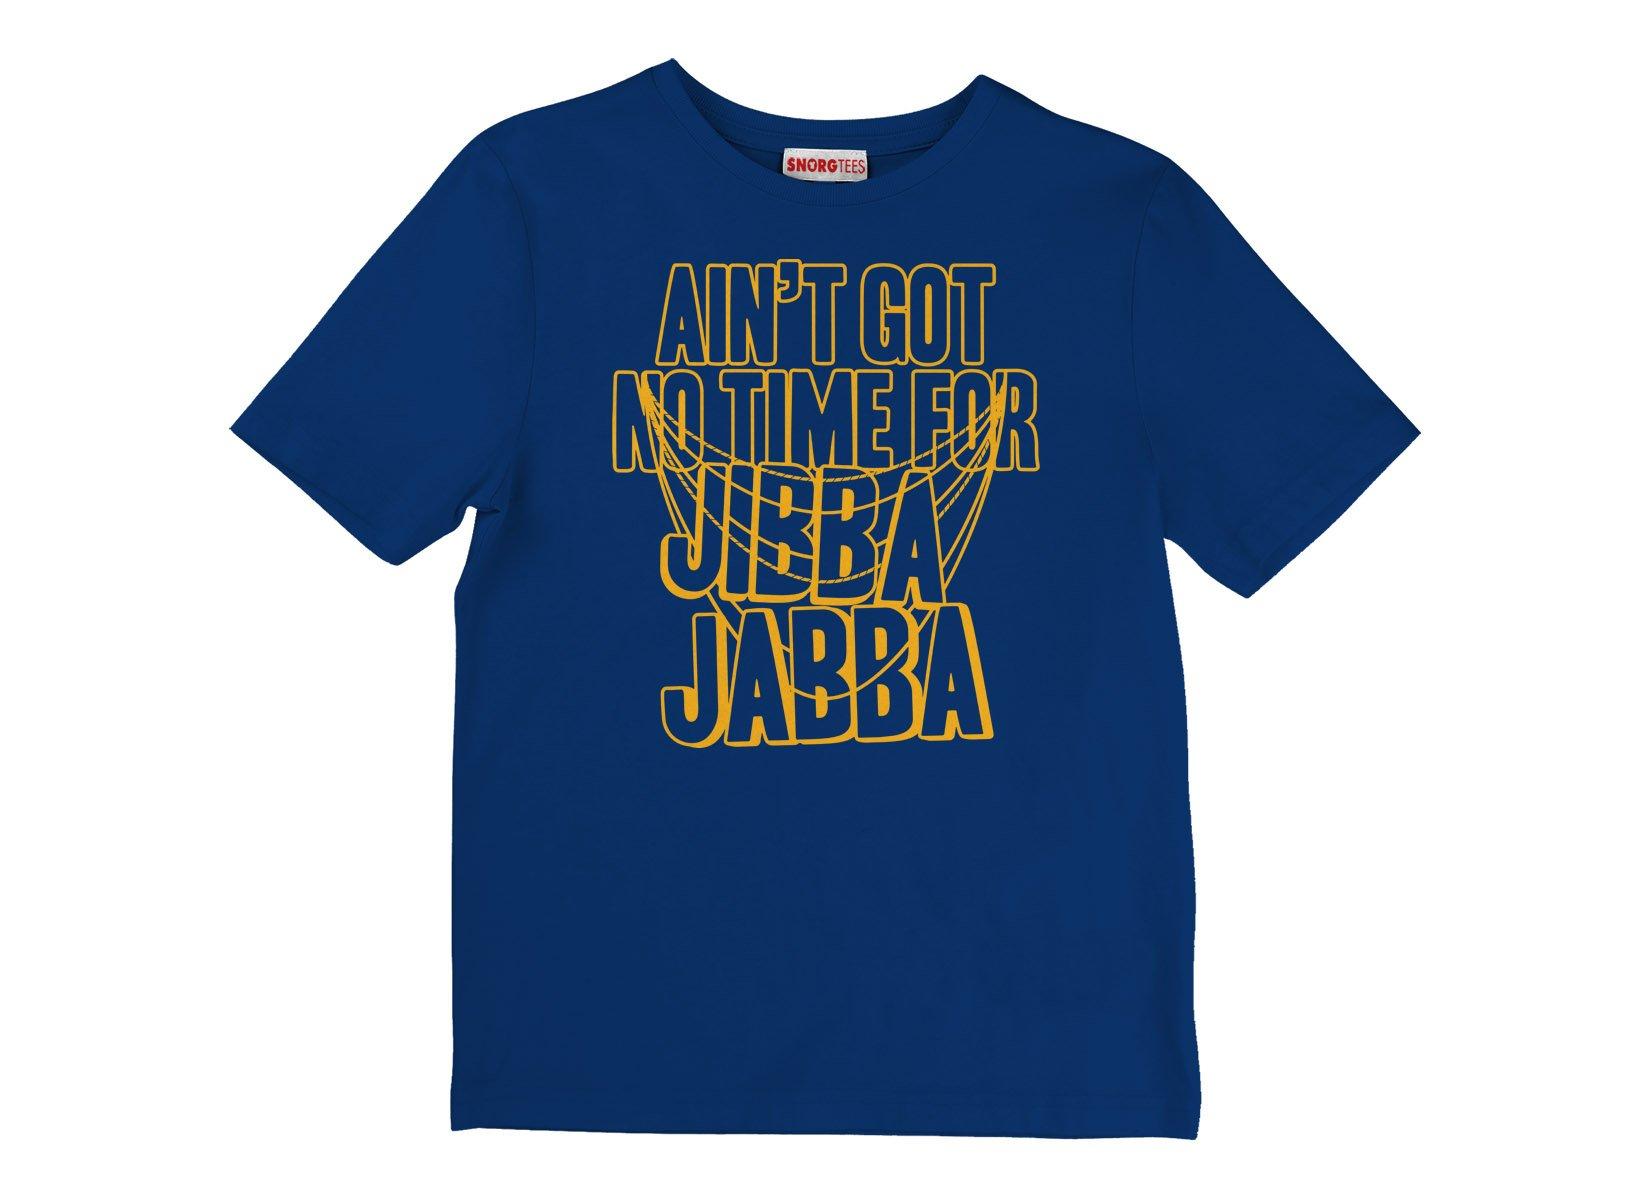 Jibba Jabba on Kids T-Shirt